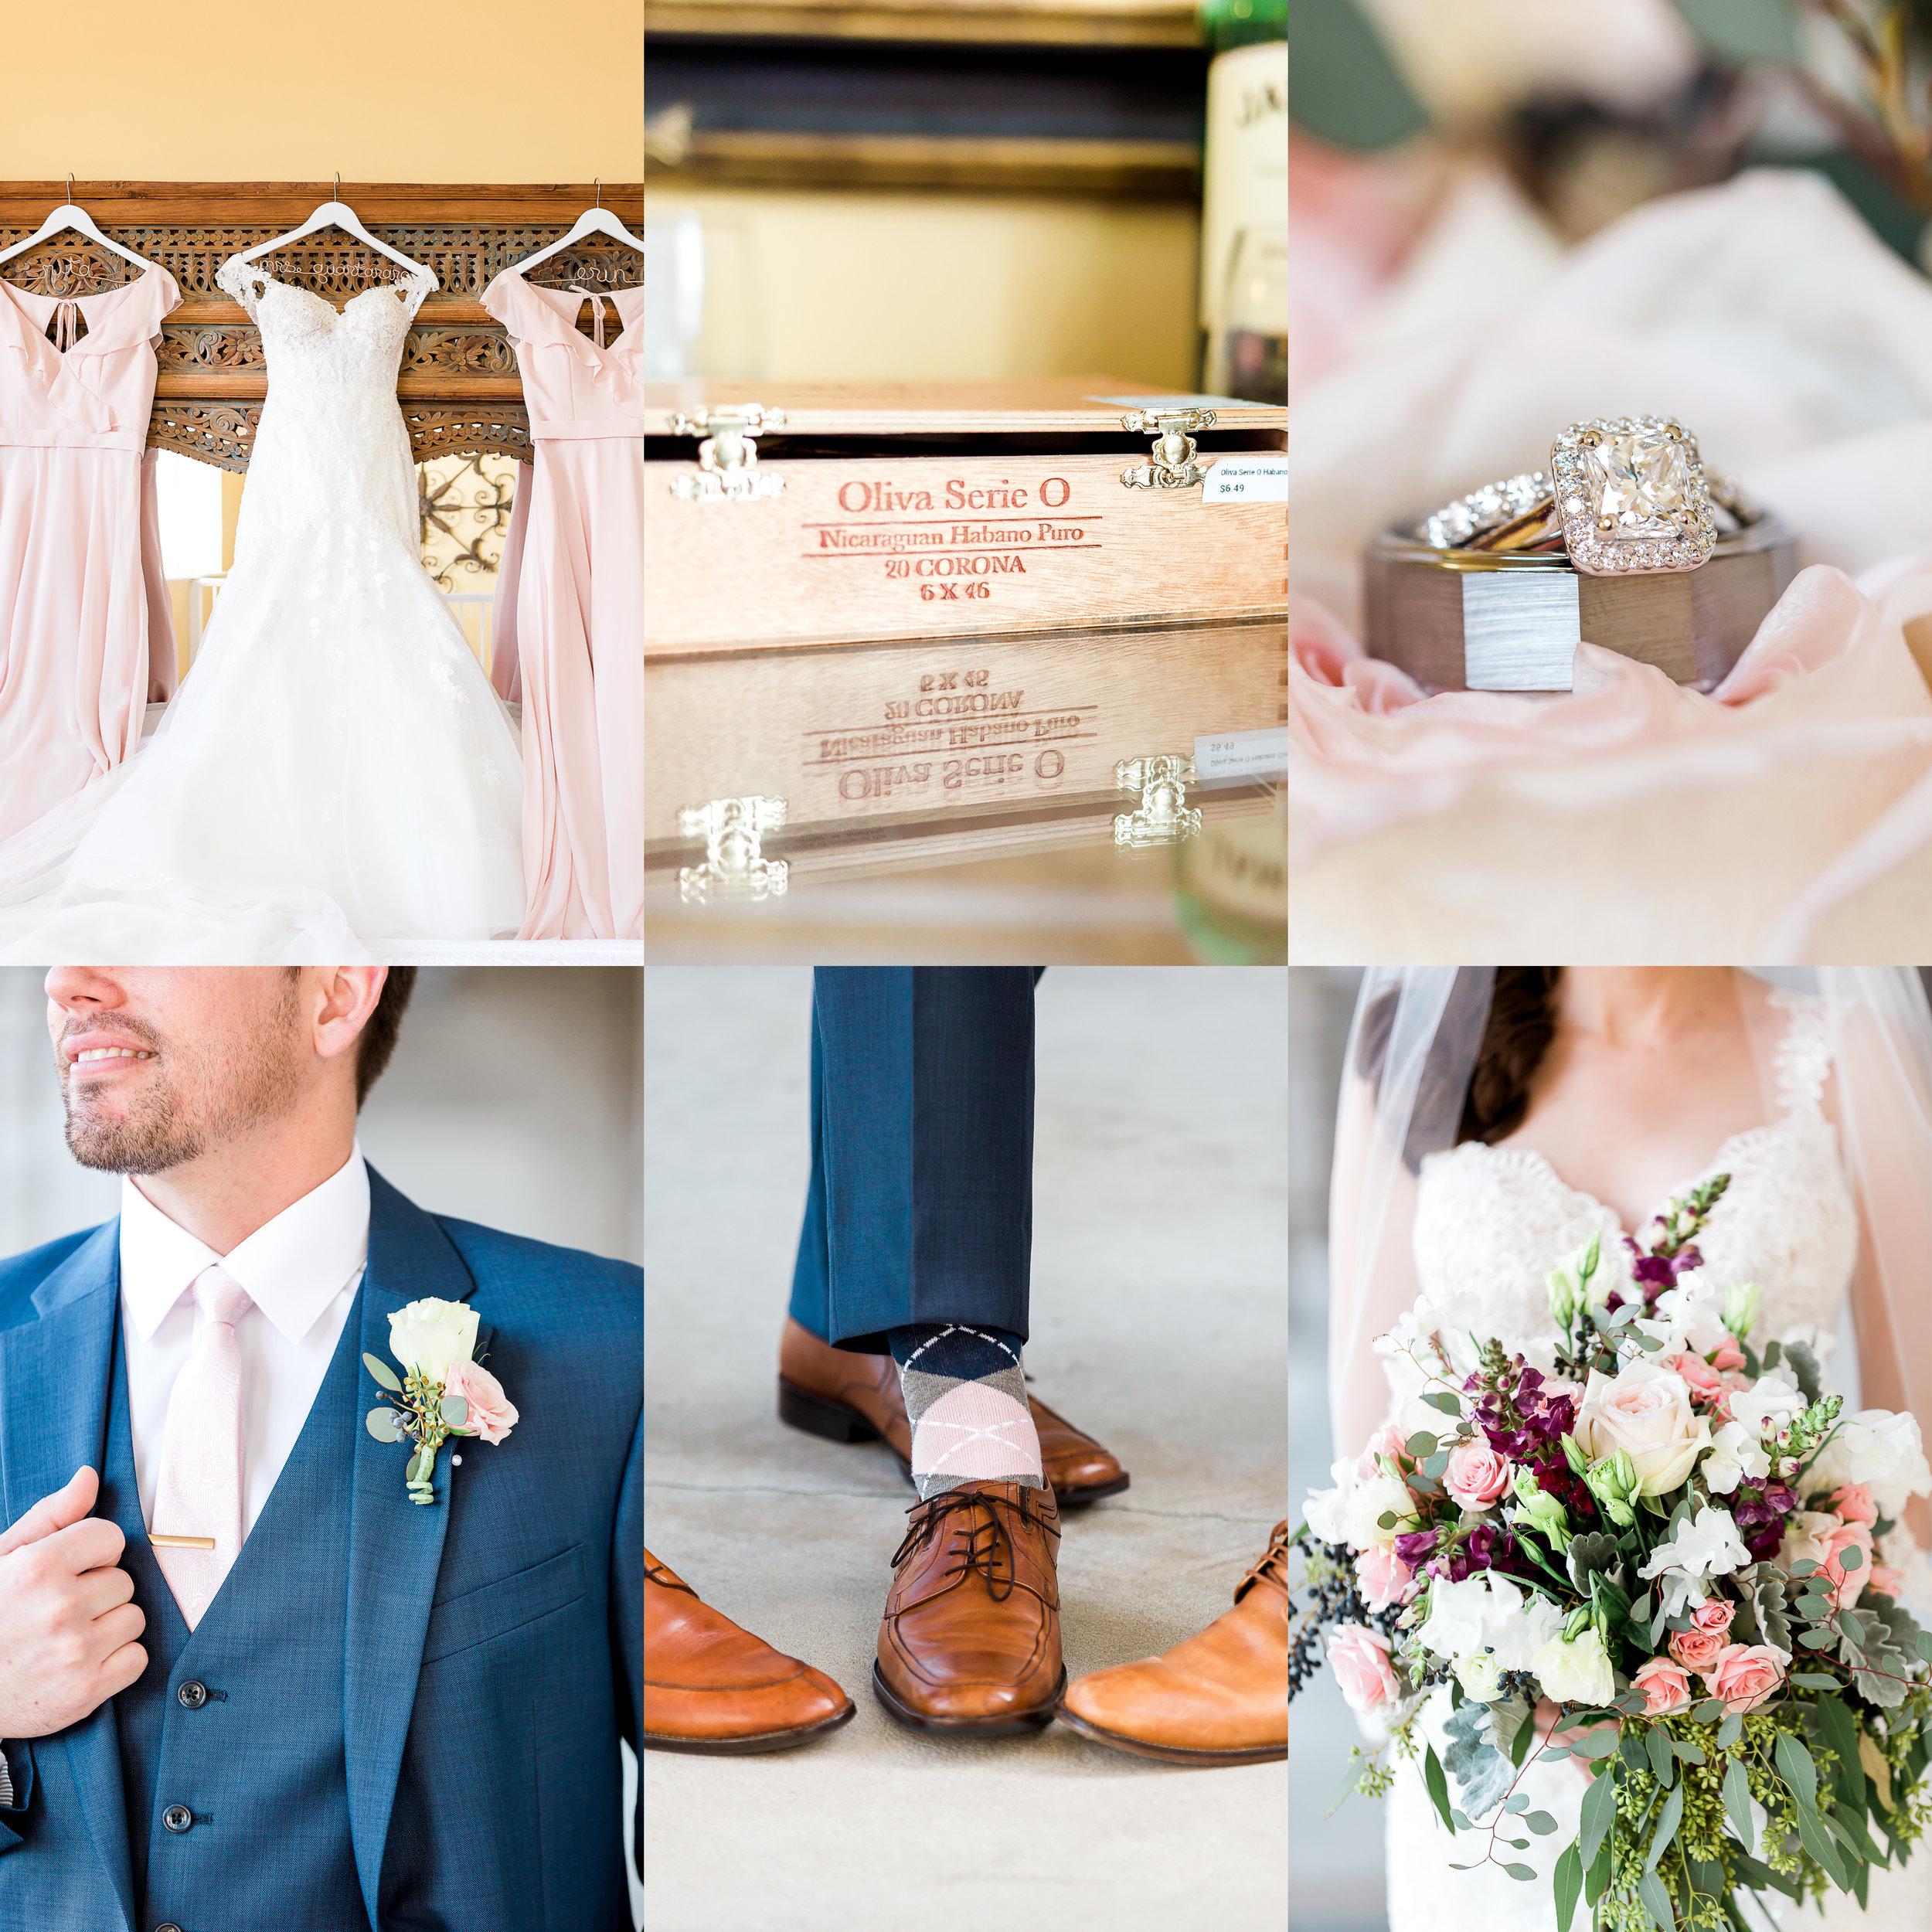 wedding details of a wedding in lightner museum and casa monica hotel, st.augustine.jpg